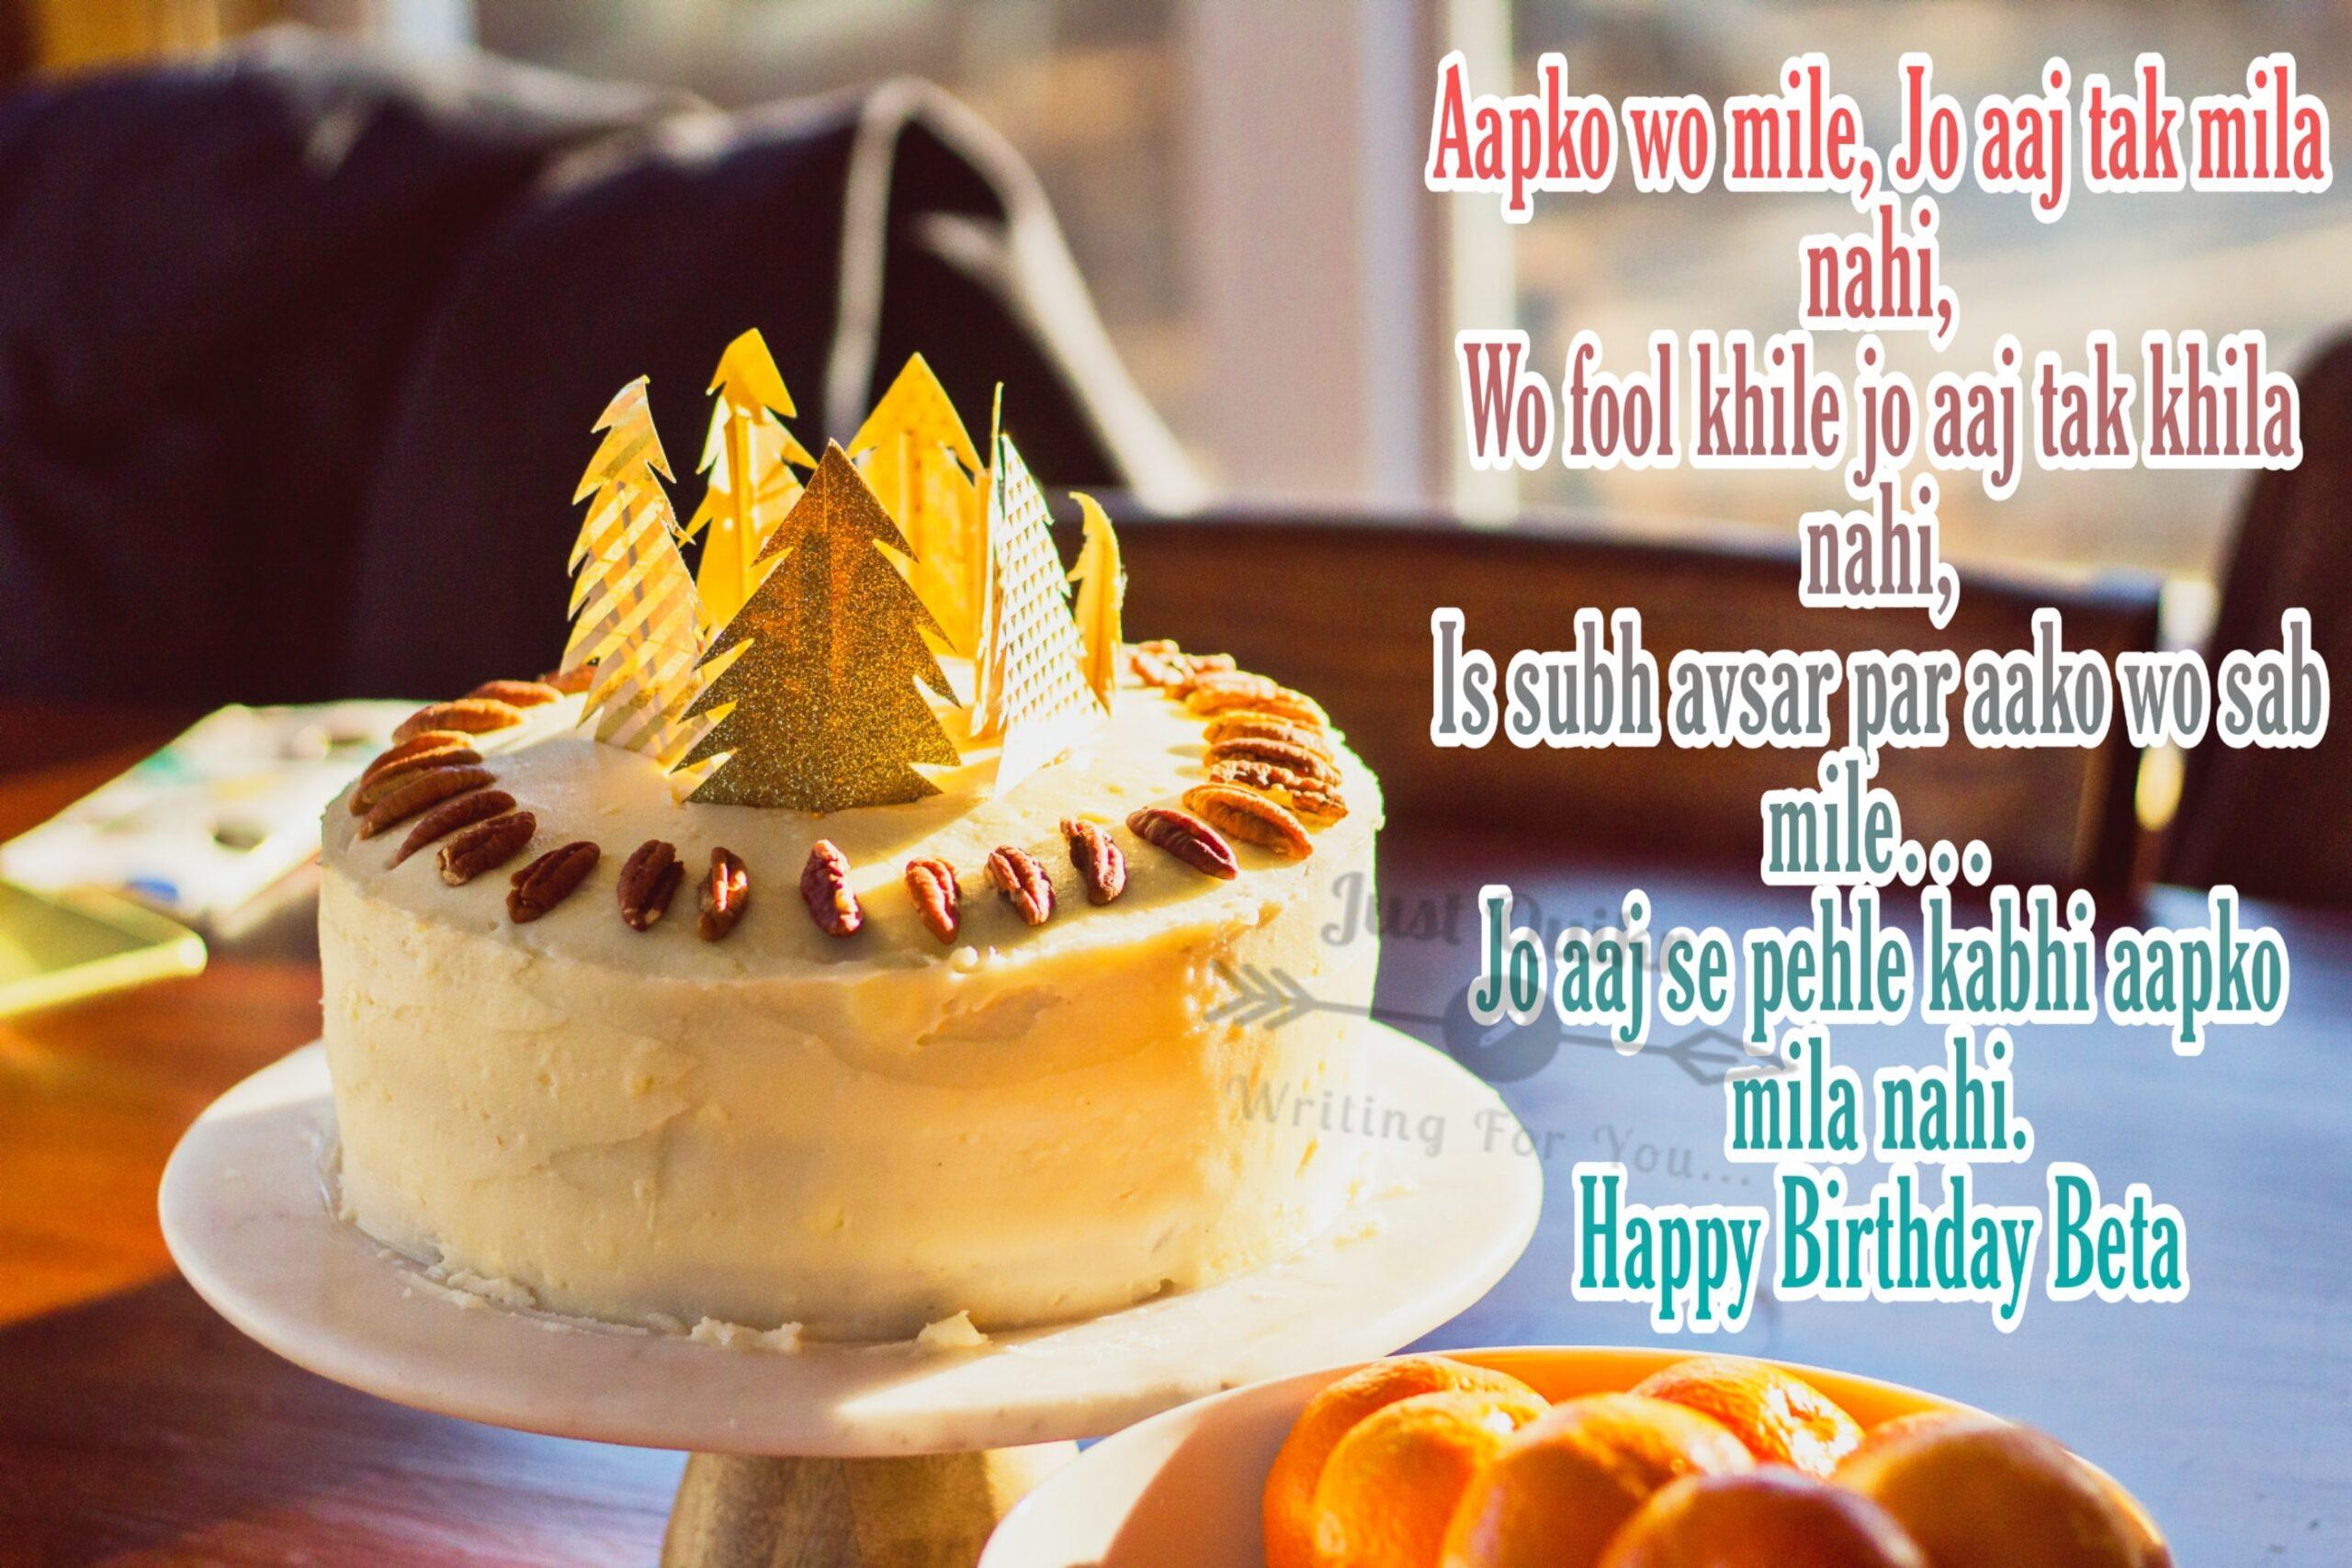 Happy Birthday Cake HD Pics Images with Shayari Sayings for Girls